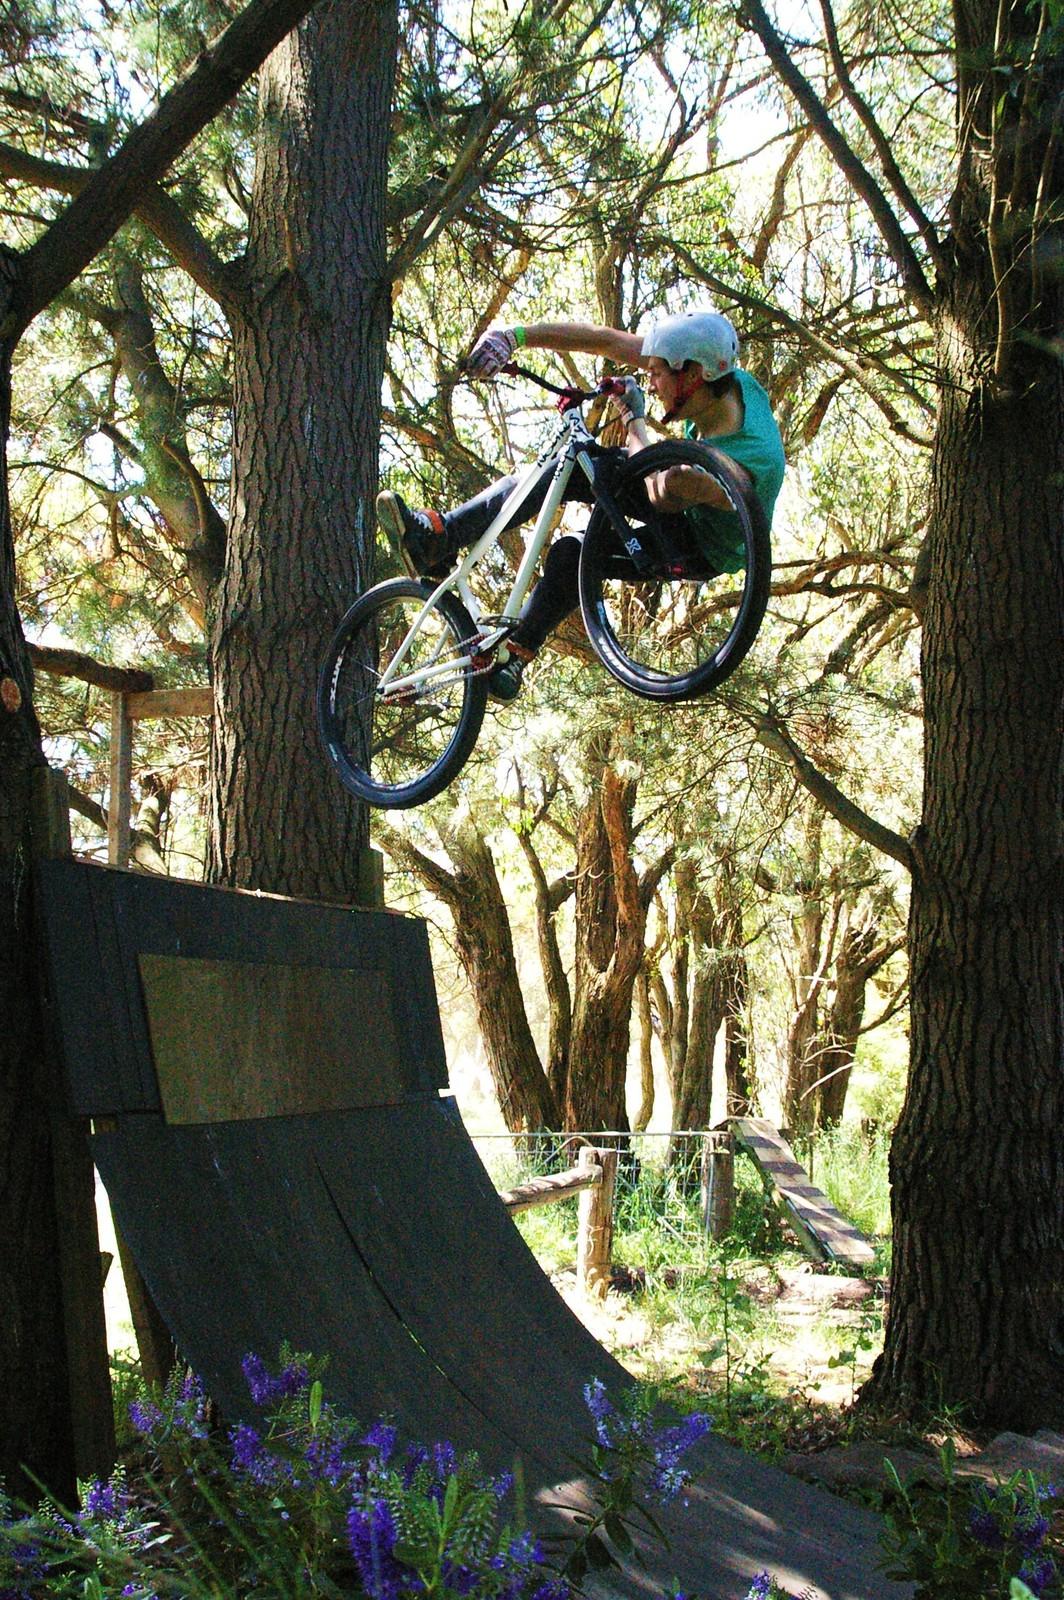 Inward Undown Air - dvkuriger - Mountain Biking Pictures - Vital MTB